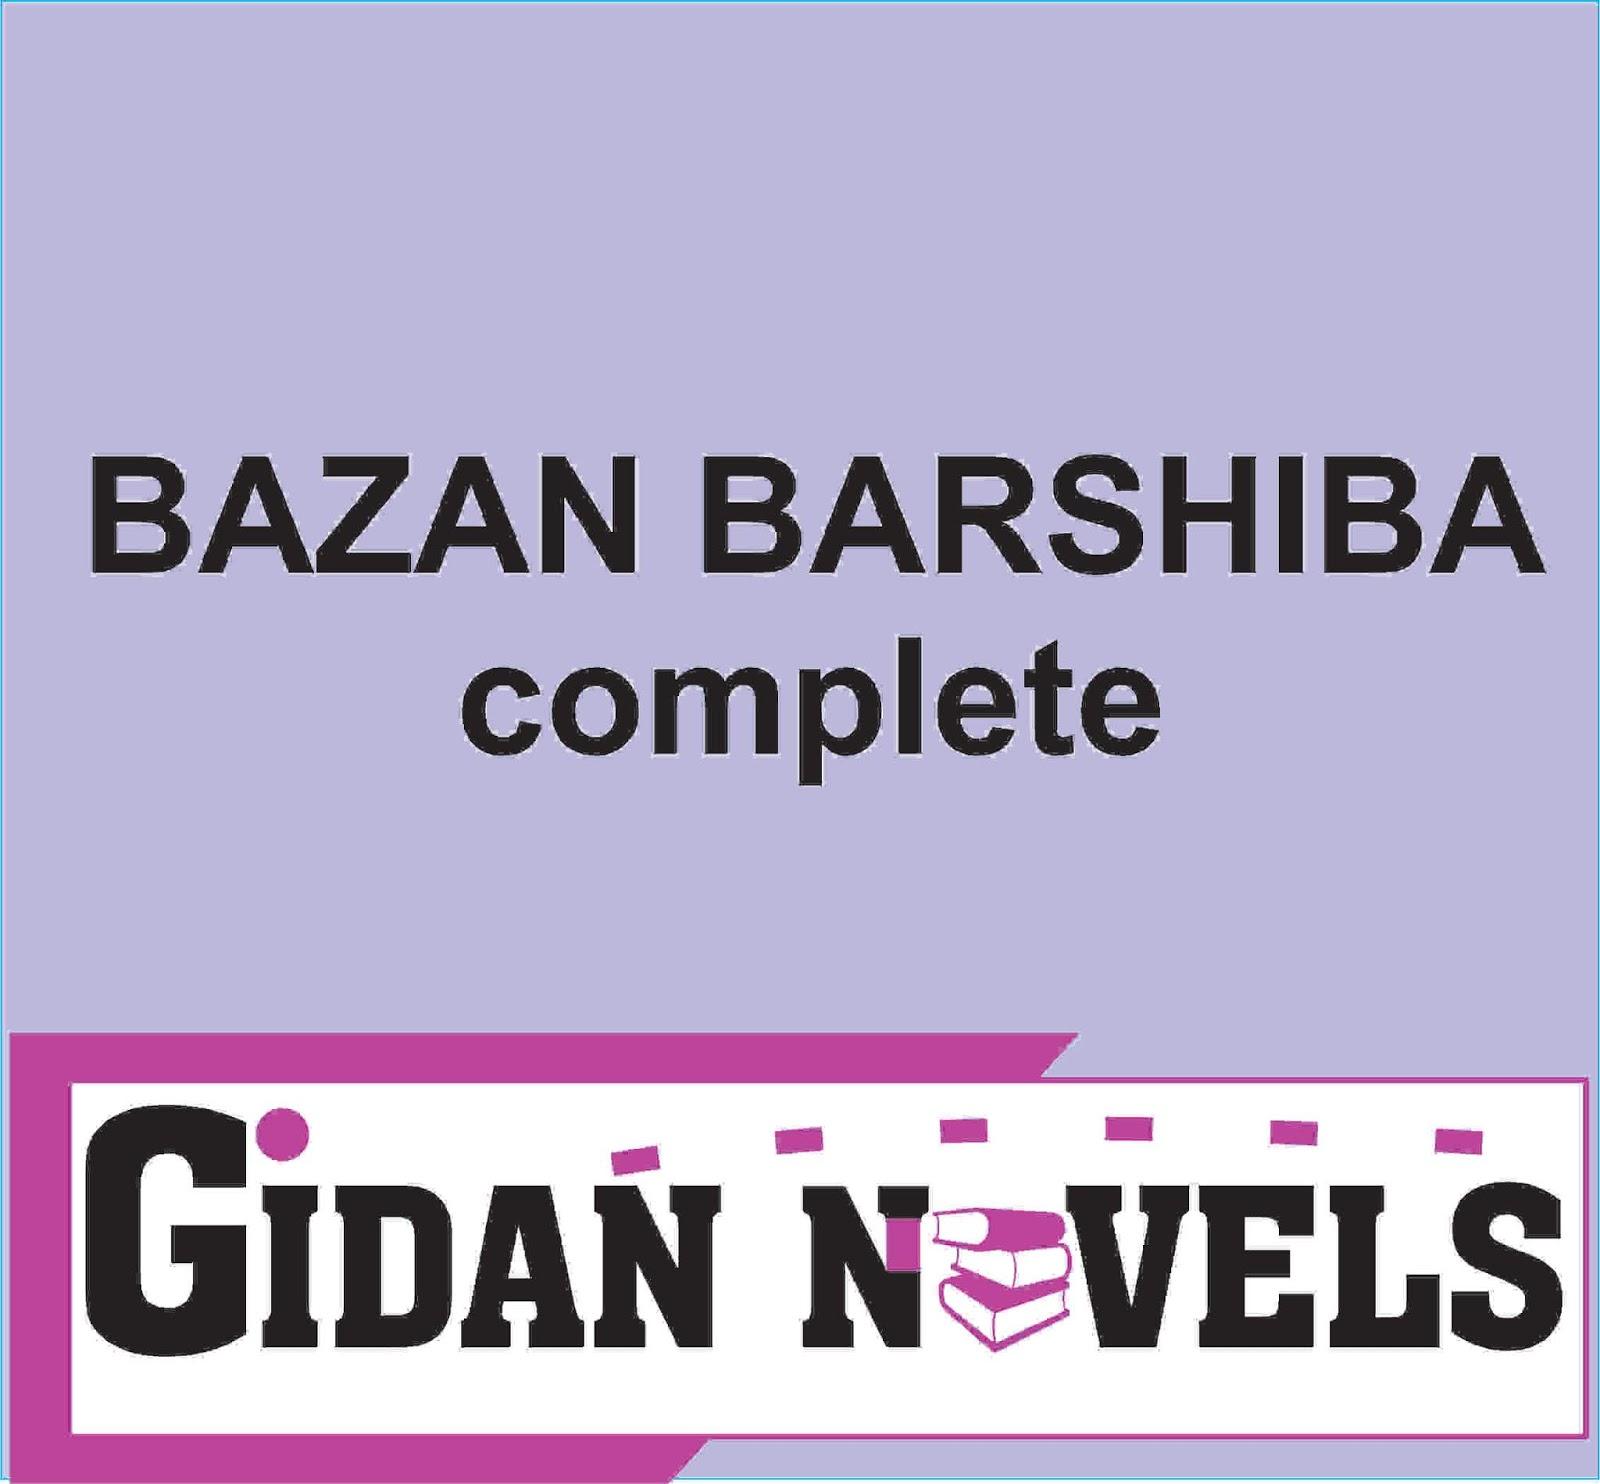 BAZAN BARSHIBA COMPLETE STORIES IN HAUSA LANGUAGE - Gidan Novels